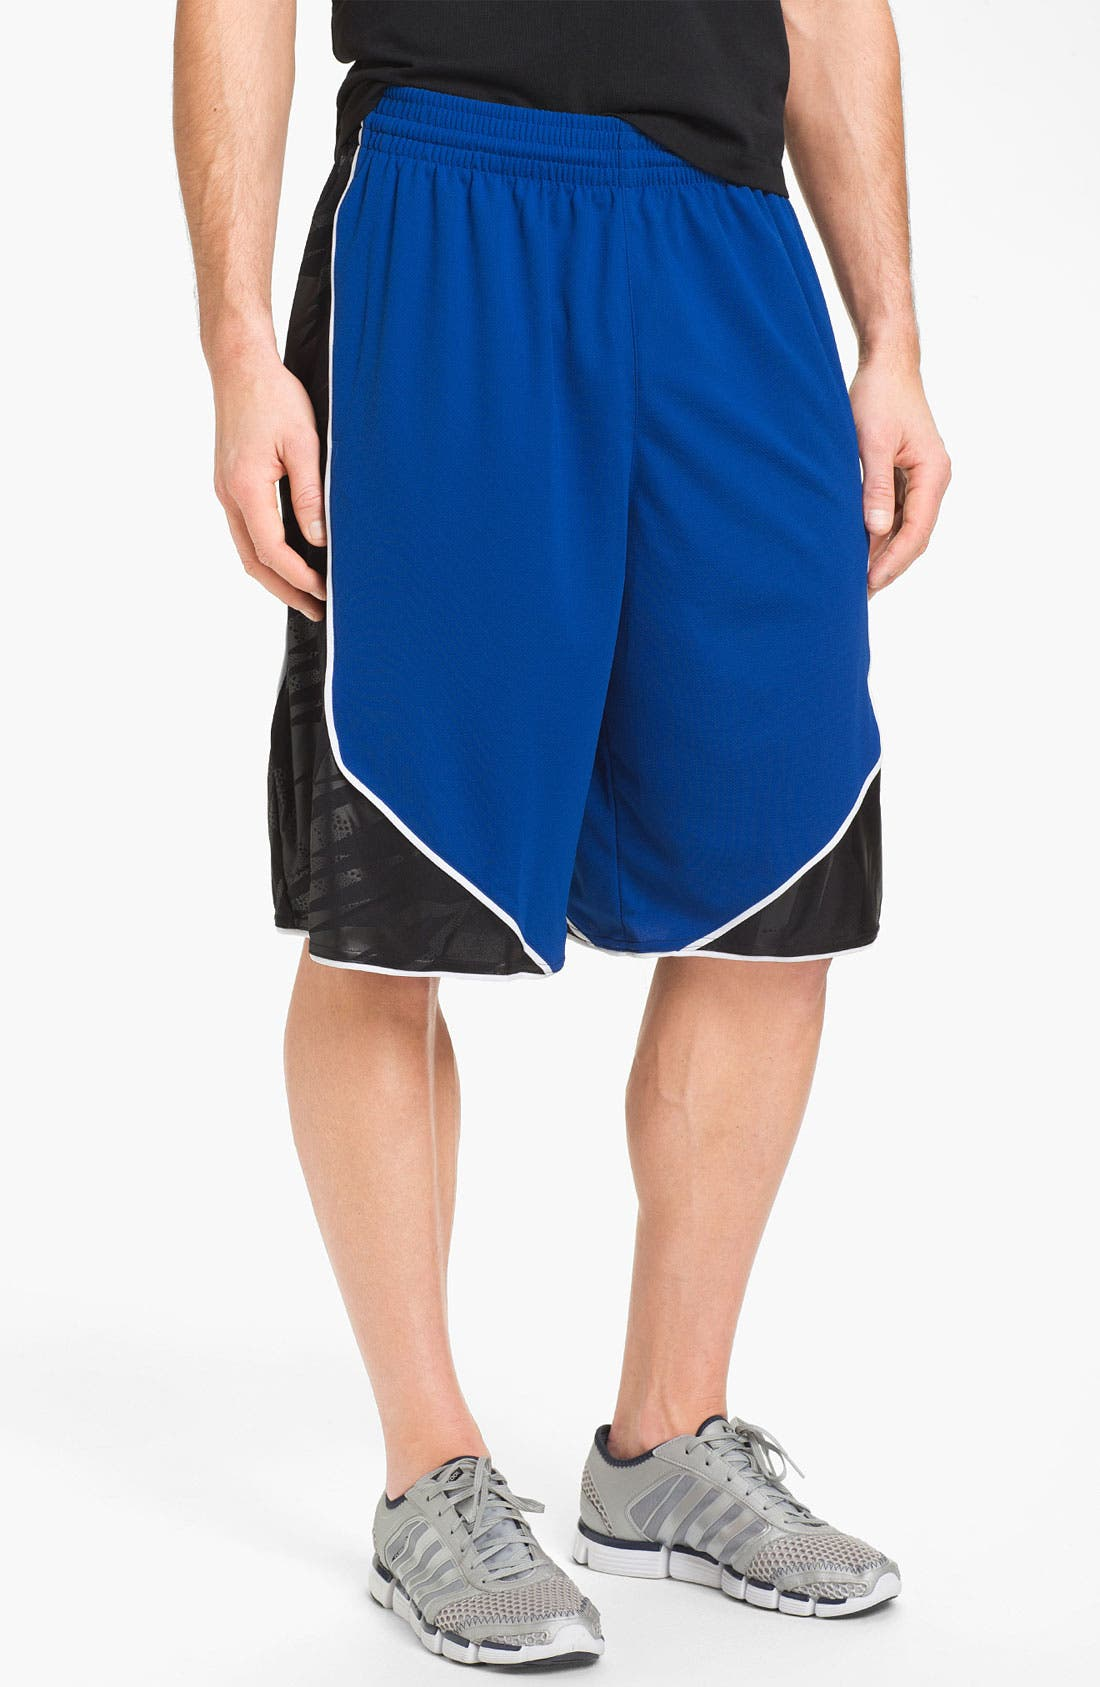 Alternate Image 1 Selected - adidas 'Alive 3.0' Shorts